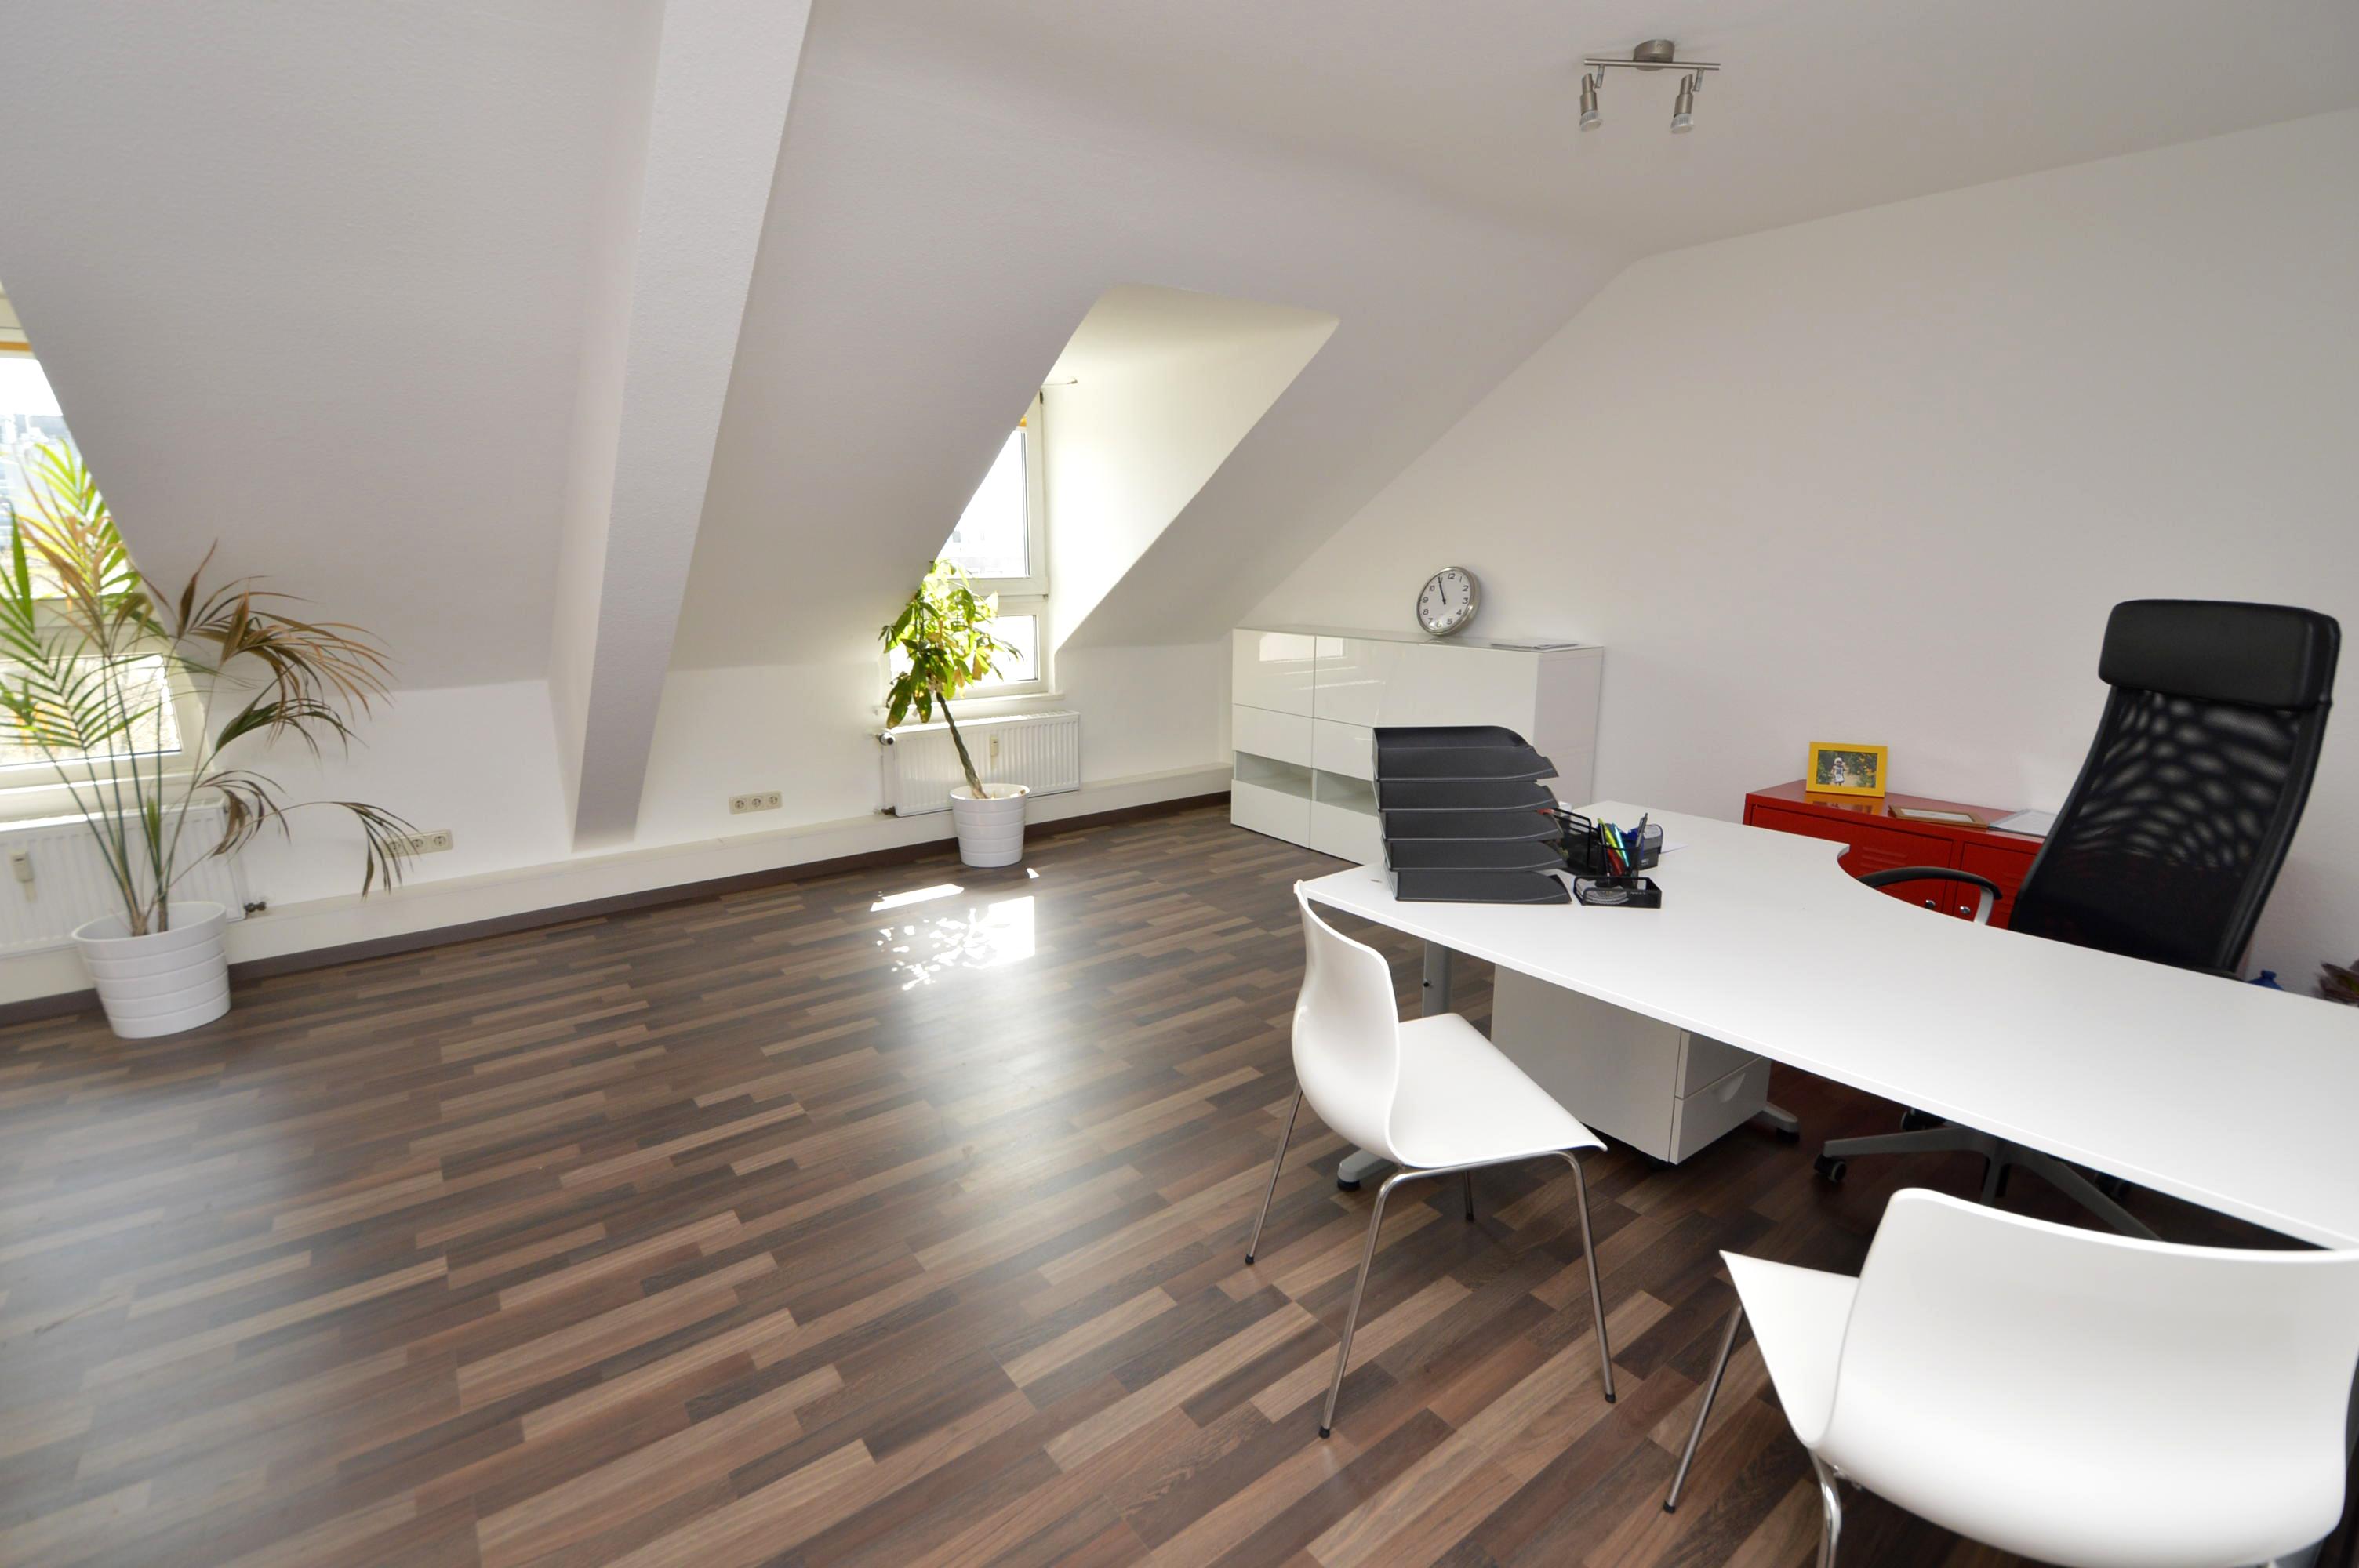 AP Immobilien GmbH - Ihr IVD Immobilienmakler aus Mainz - 55118 Mainz